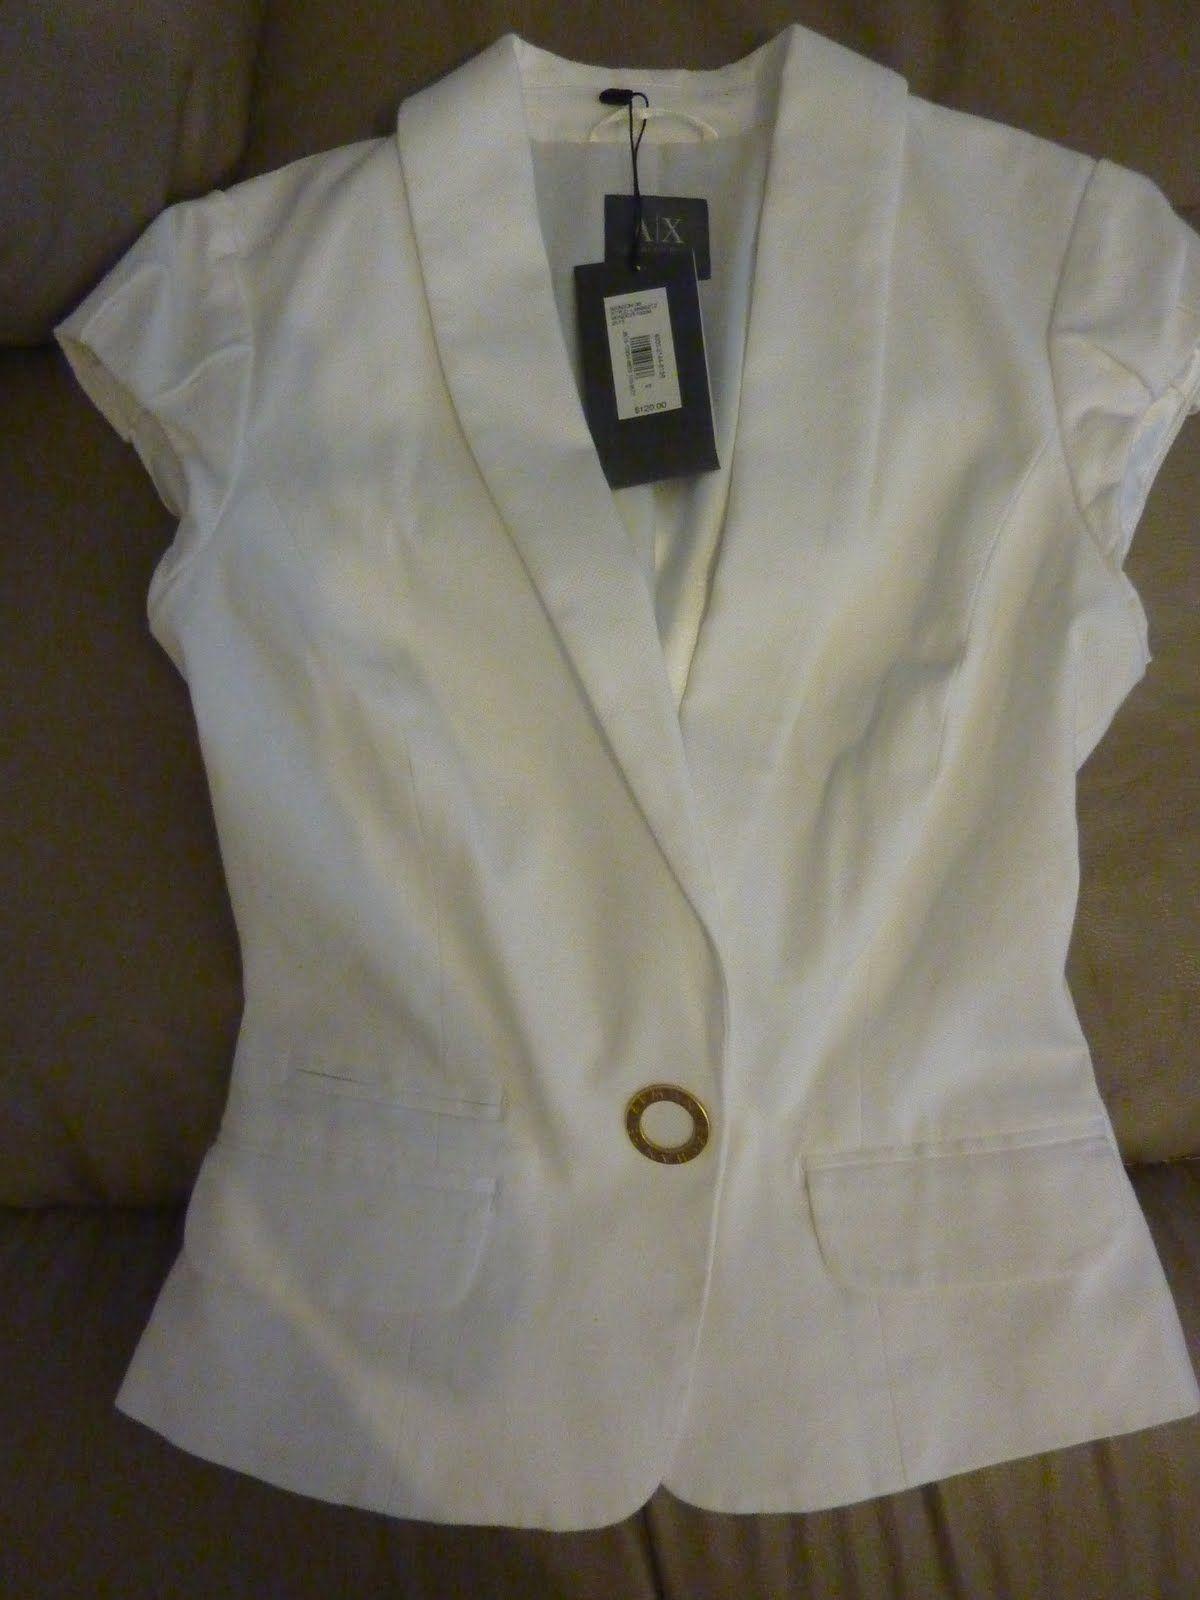 547f5c4f6 blazer feminino manga curta - Pesquisa Google